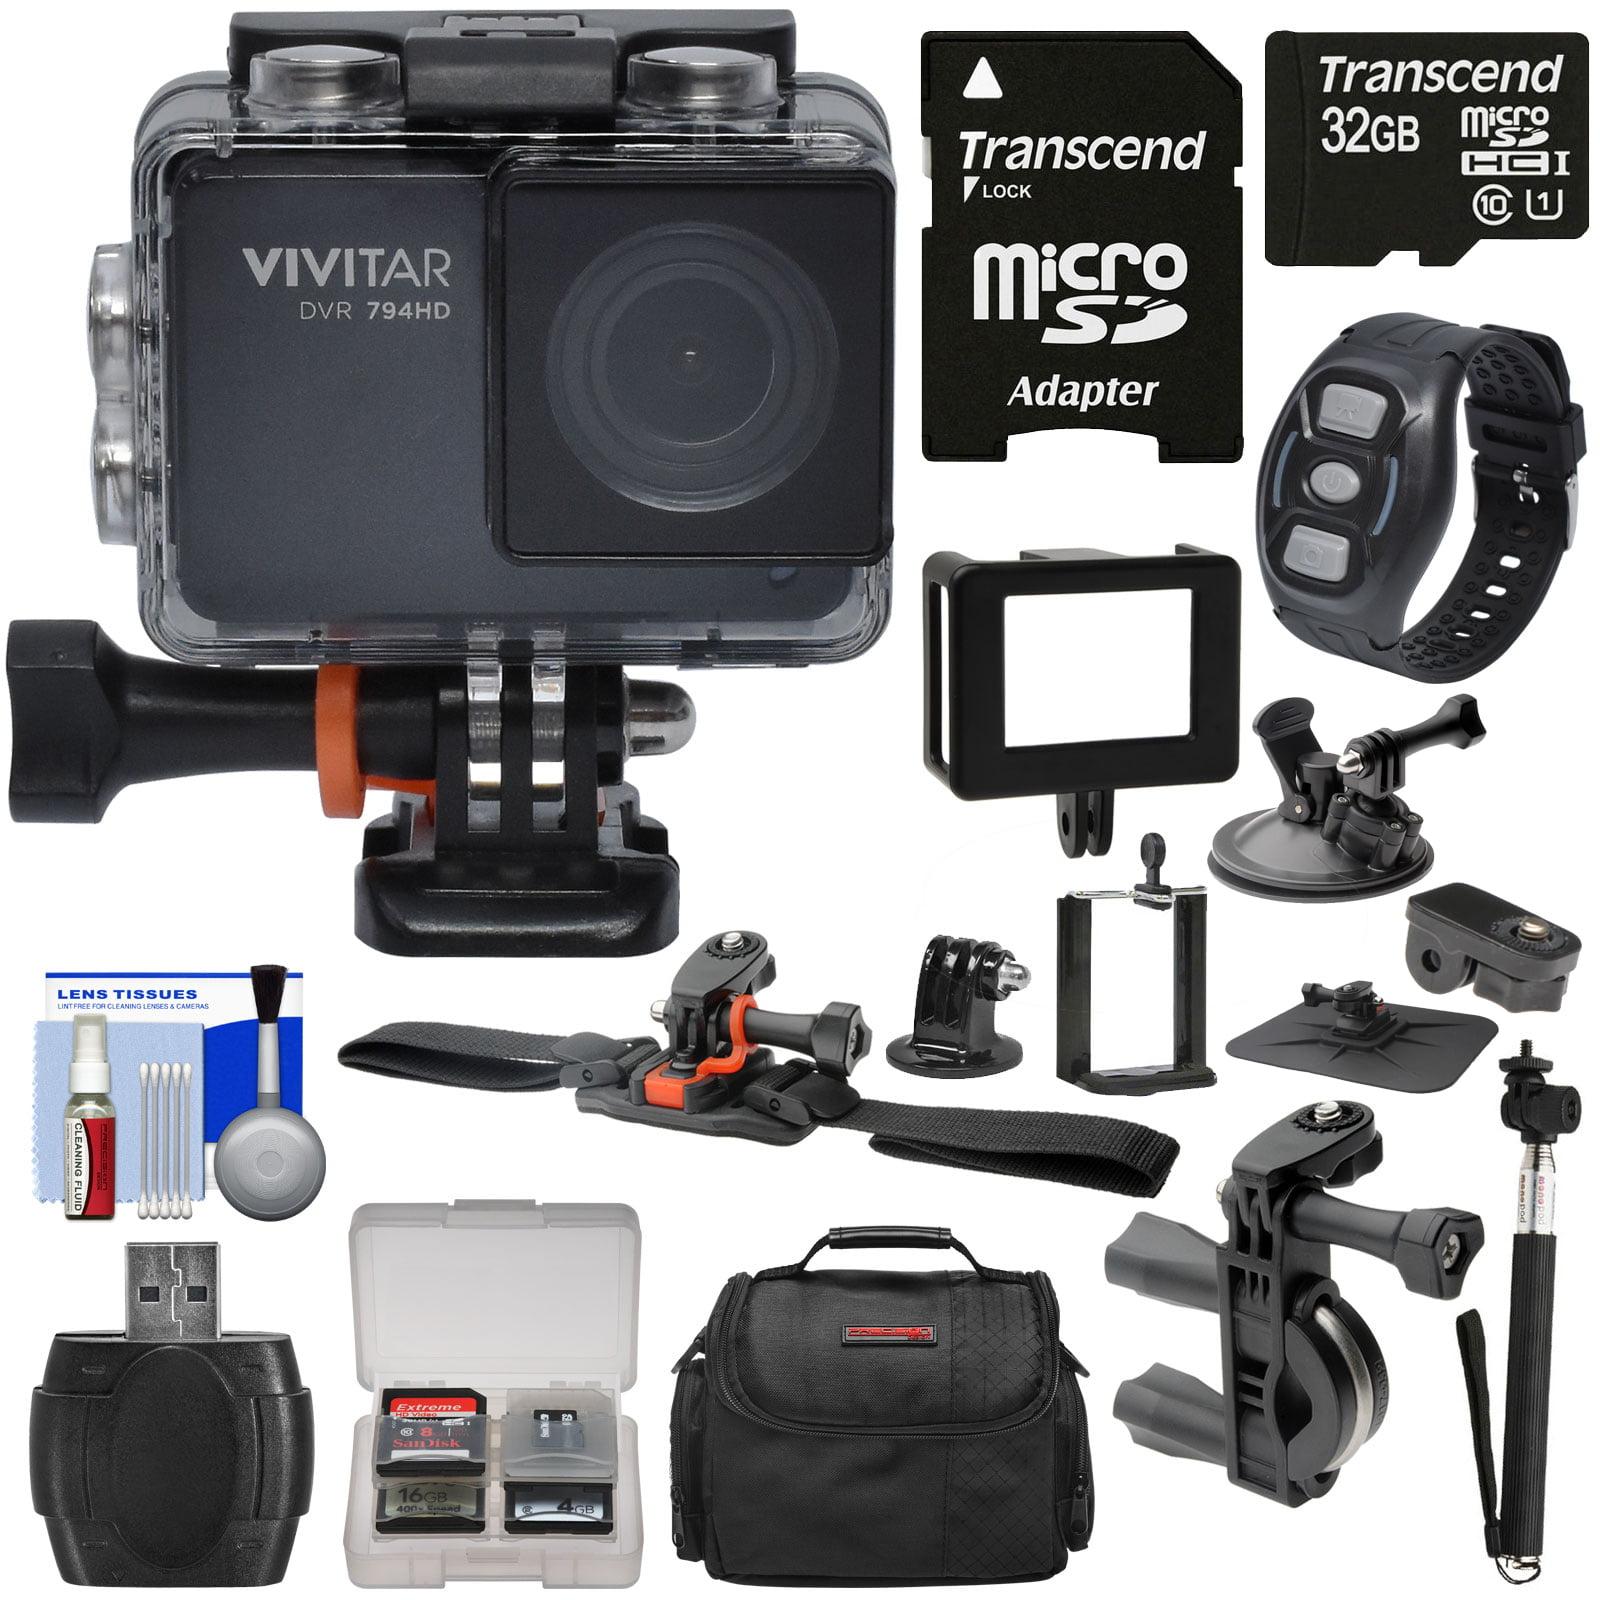 Vivitar DVR794HD 1080p HD Wi-Fi Waterproof Action Video C...